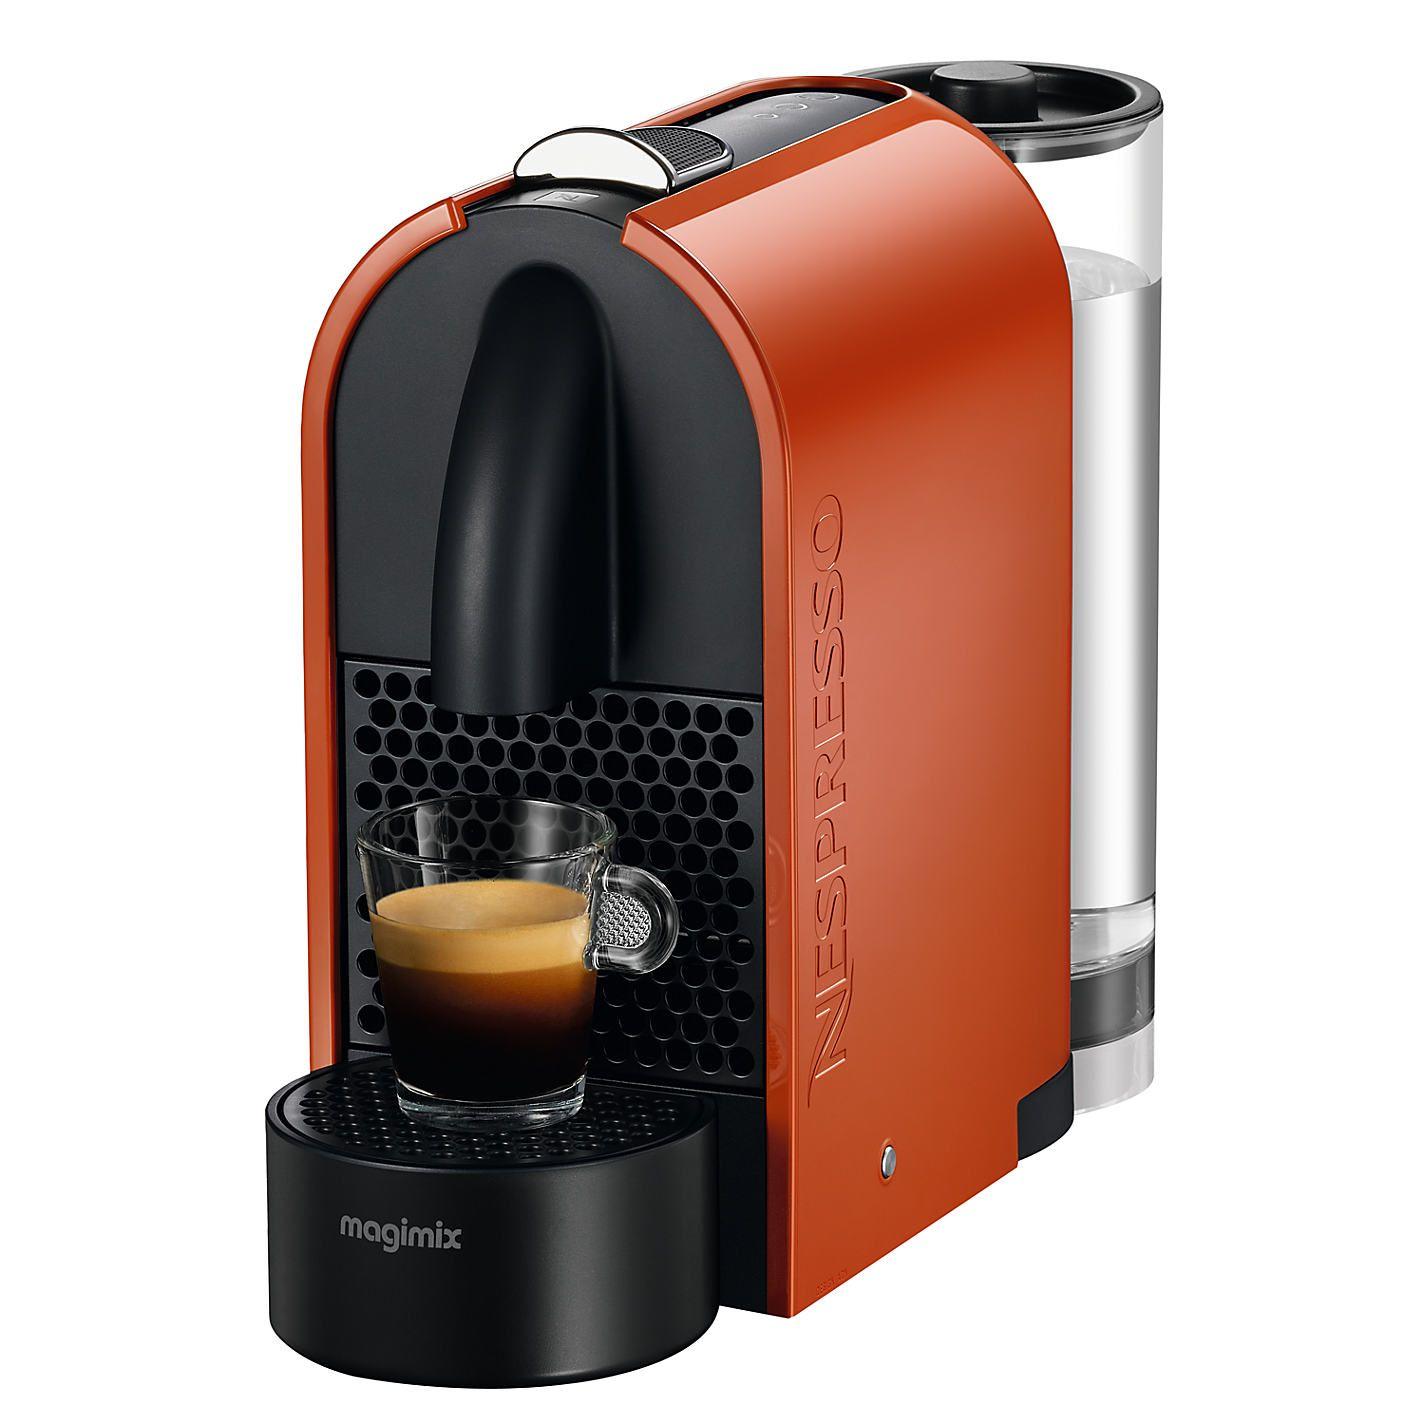 nespresso machine google search object reference pinterest nespresso machine google search small kitchen appliancessmall